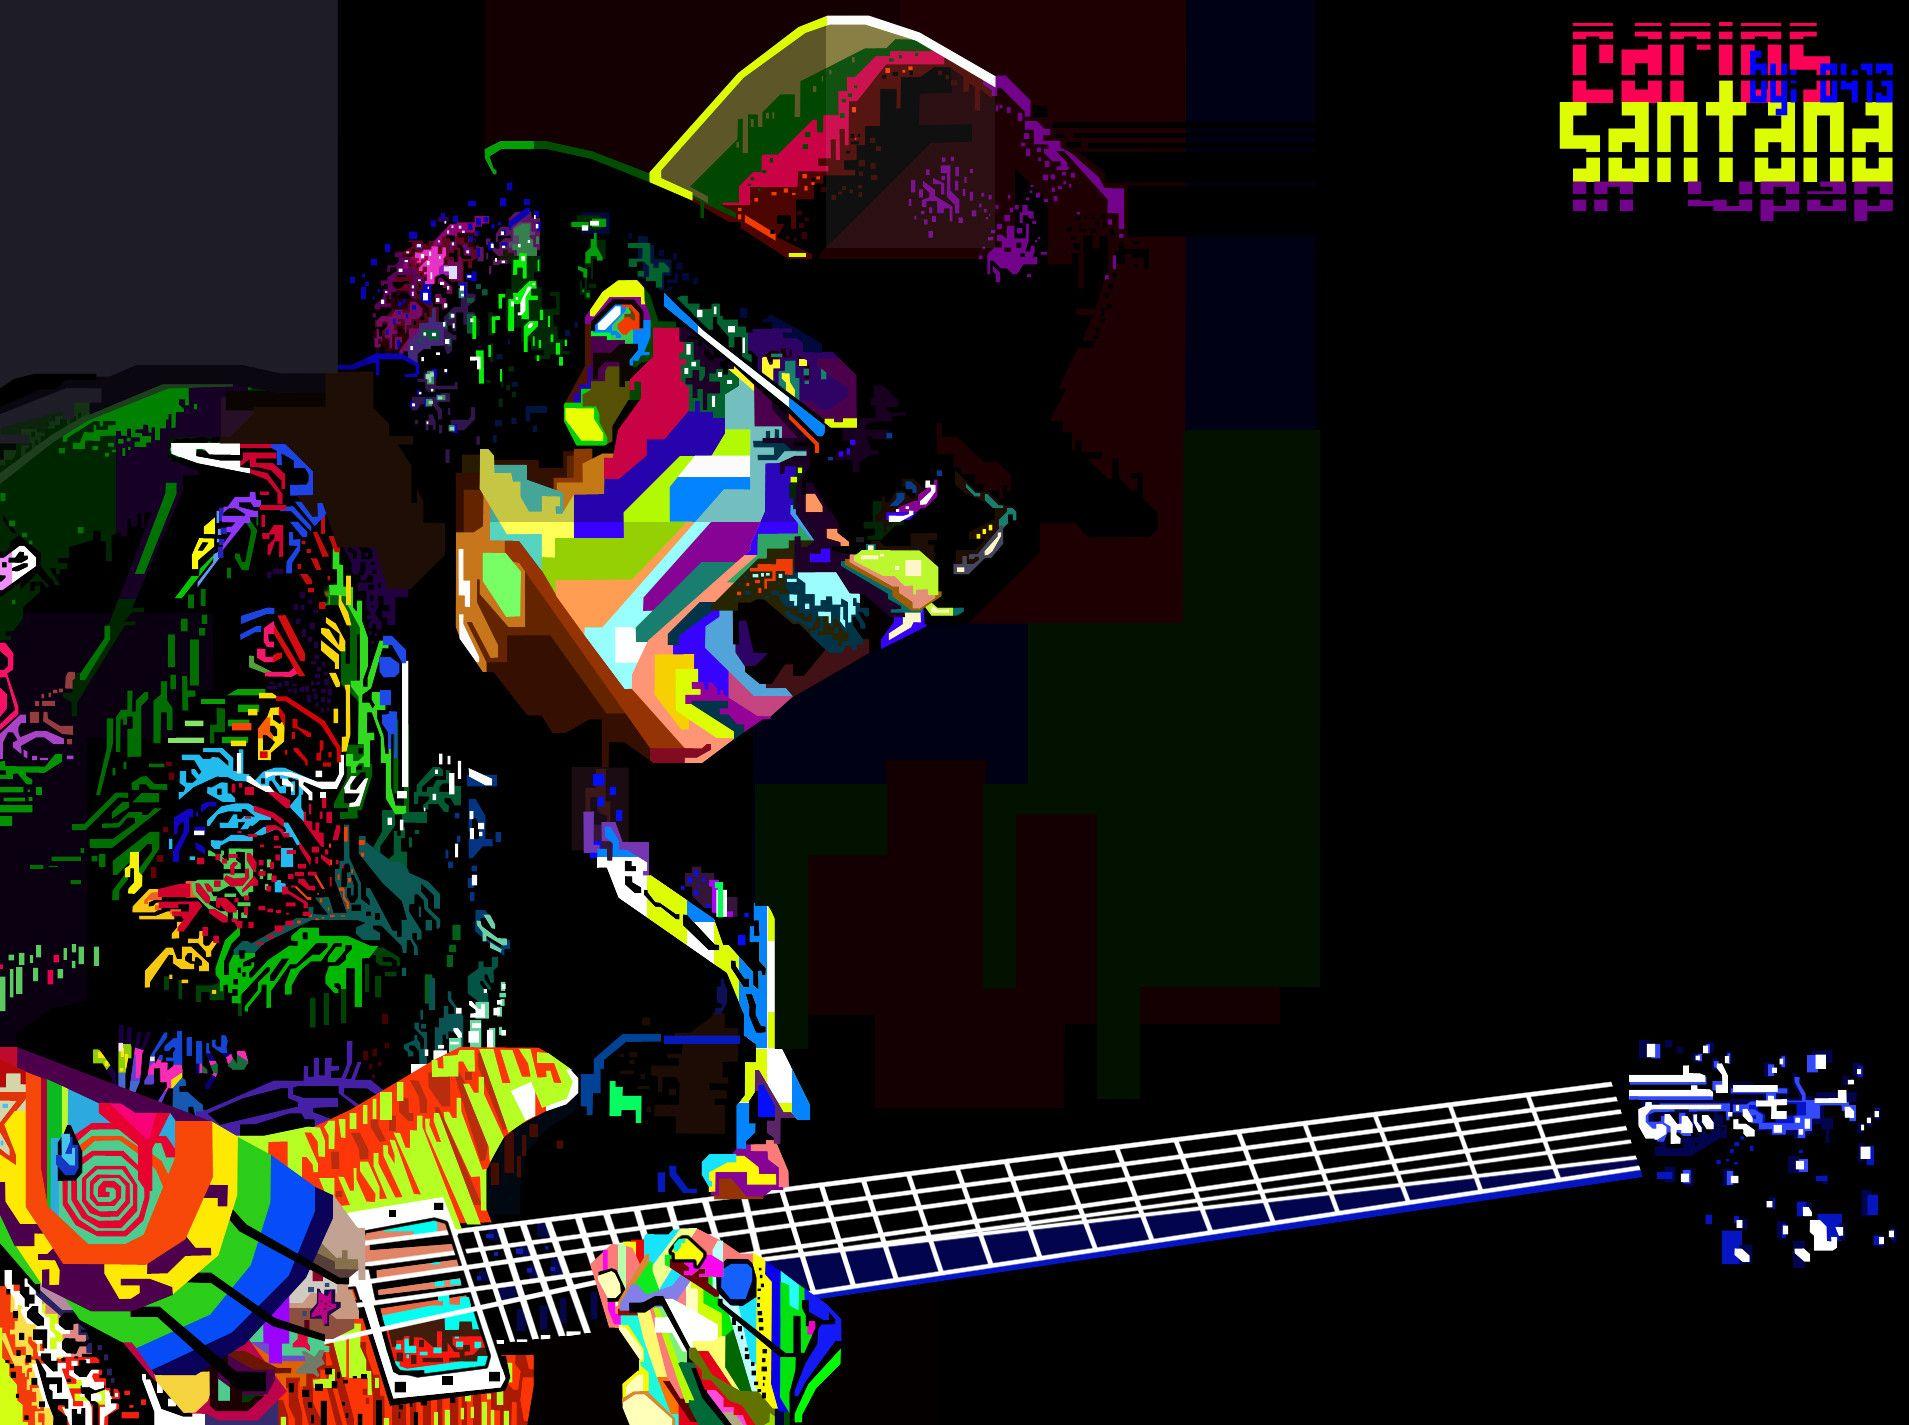 1909x1425px Carlos Santana Wallpaper 1909x1425